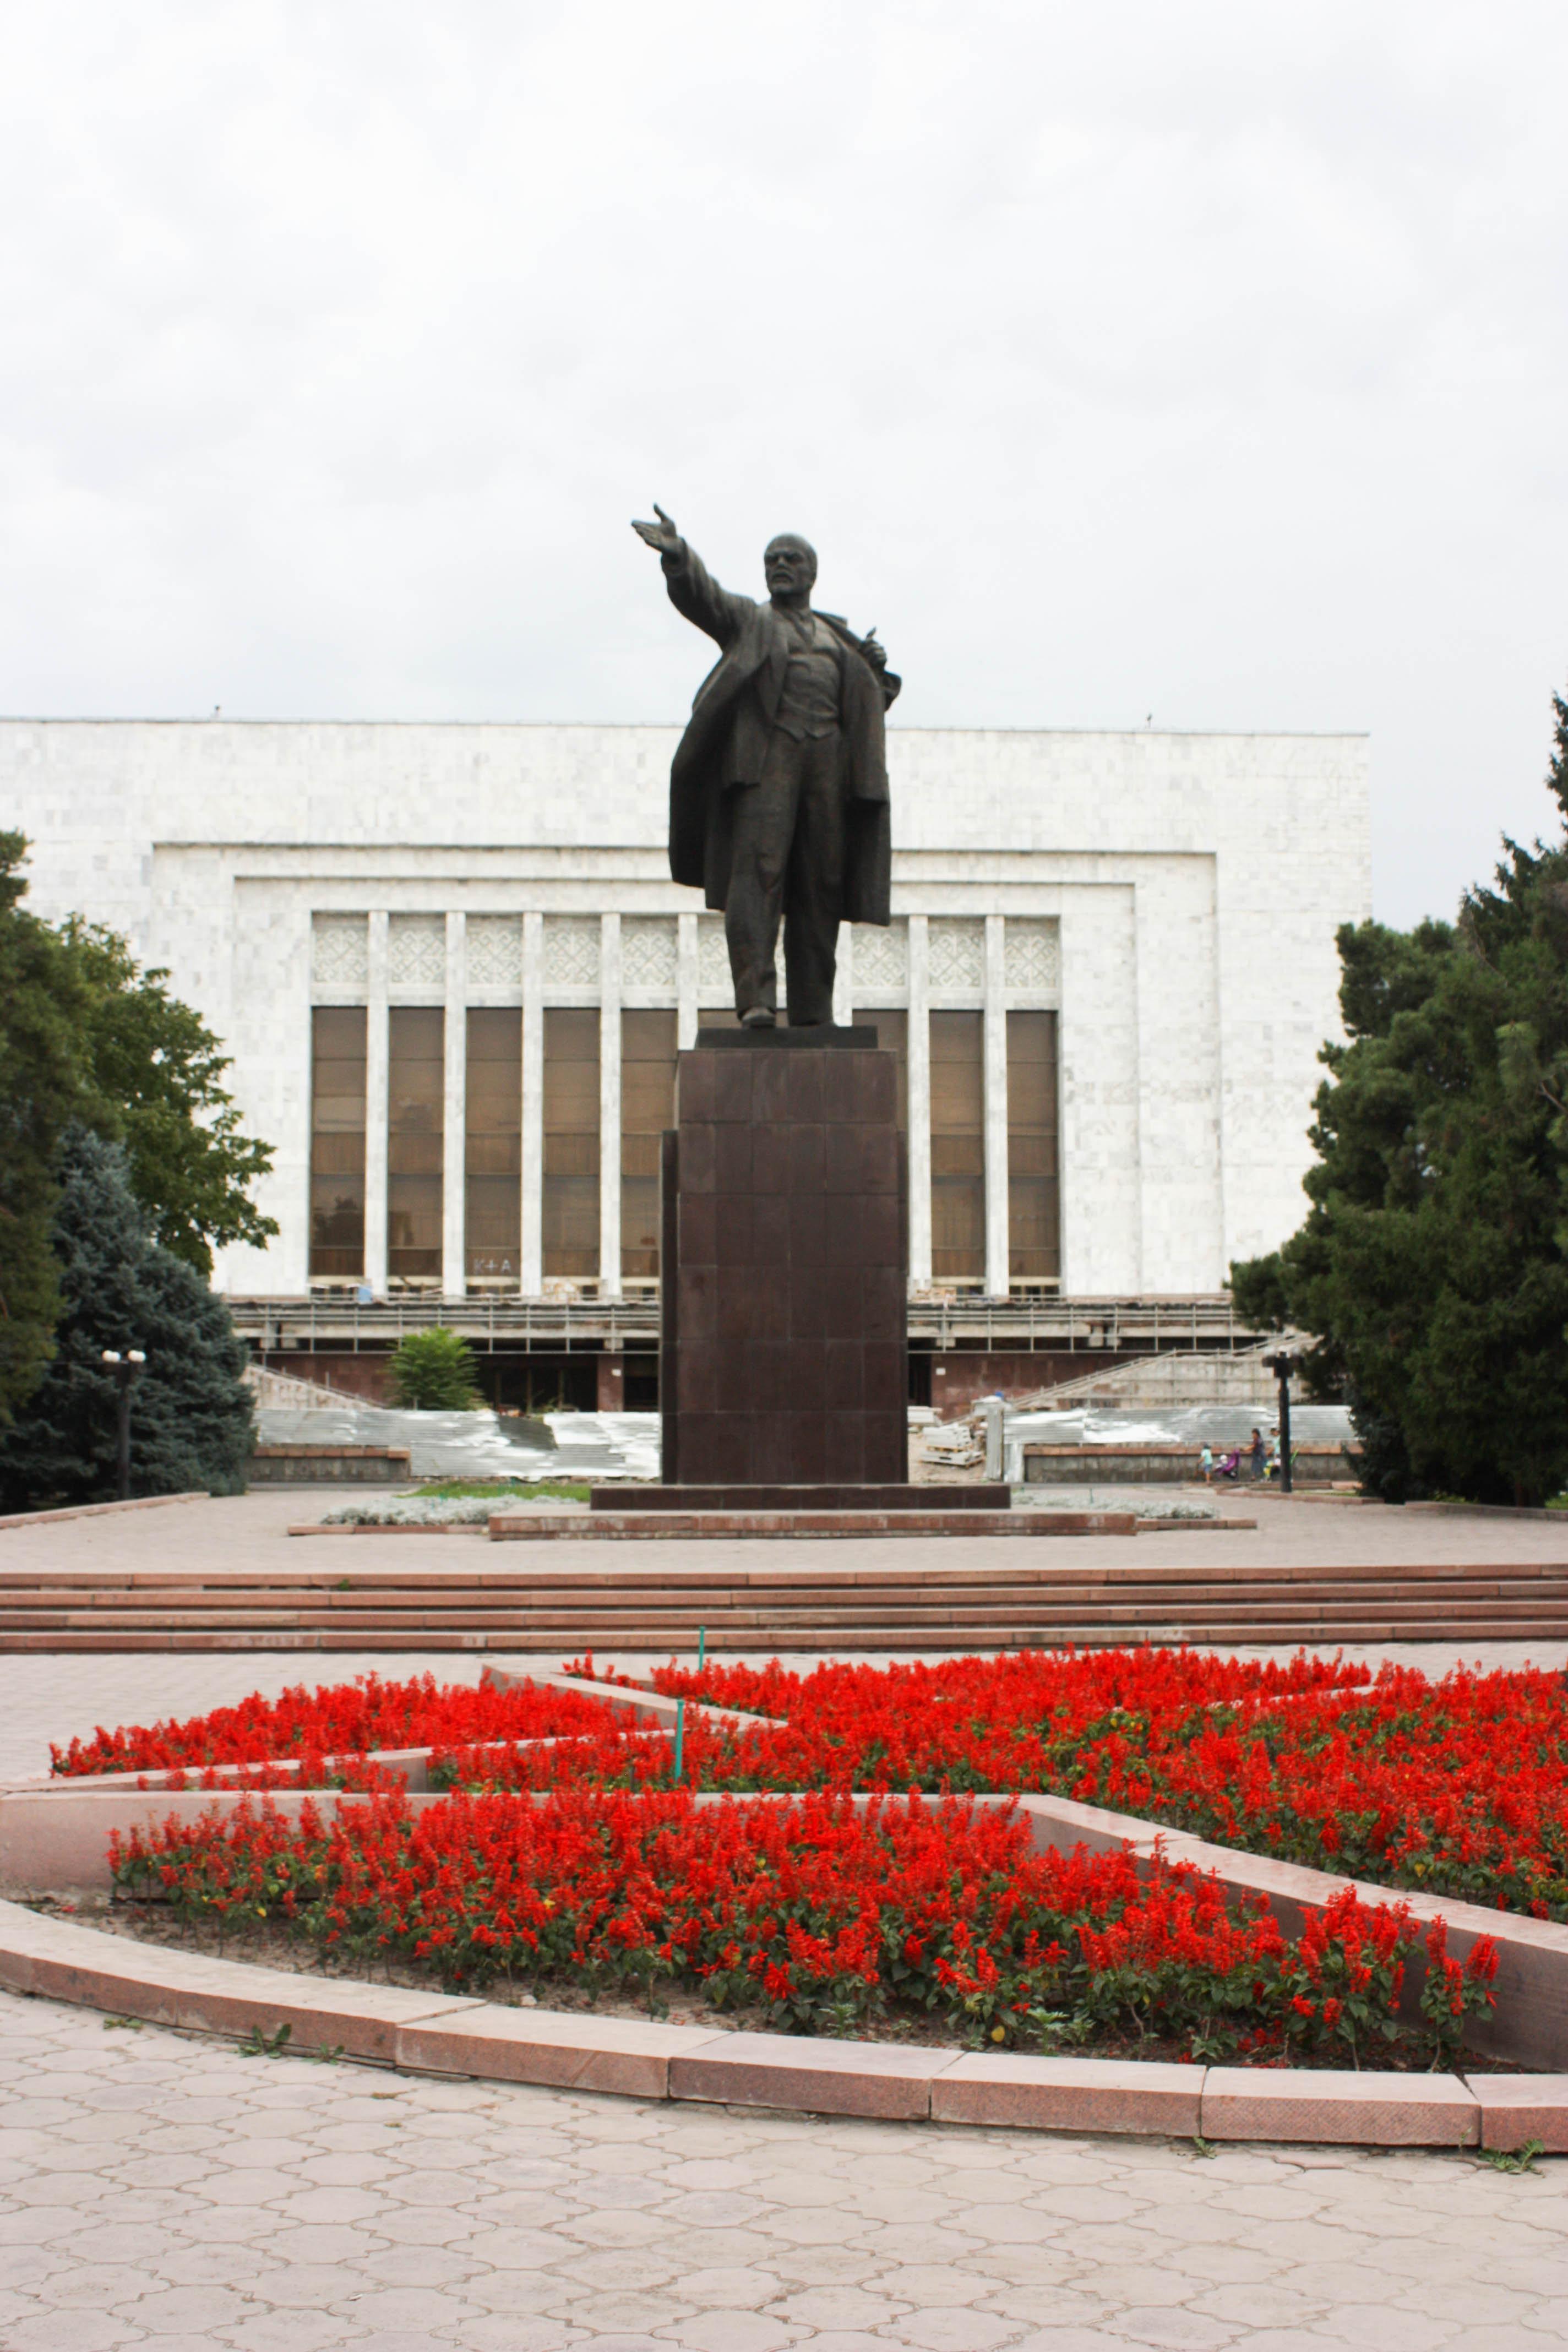 Statue of Vladimir Lenin in the country's capital of Bishkek